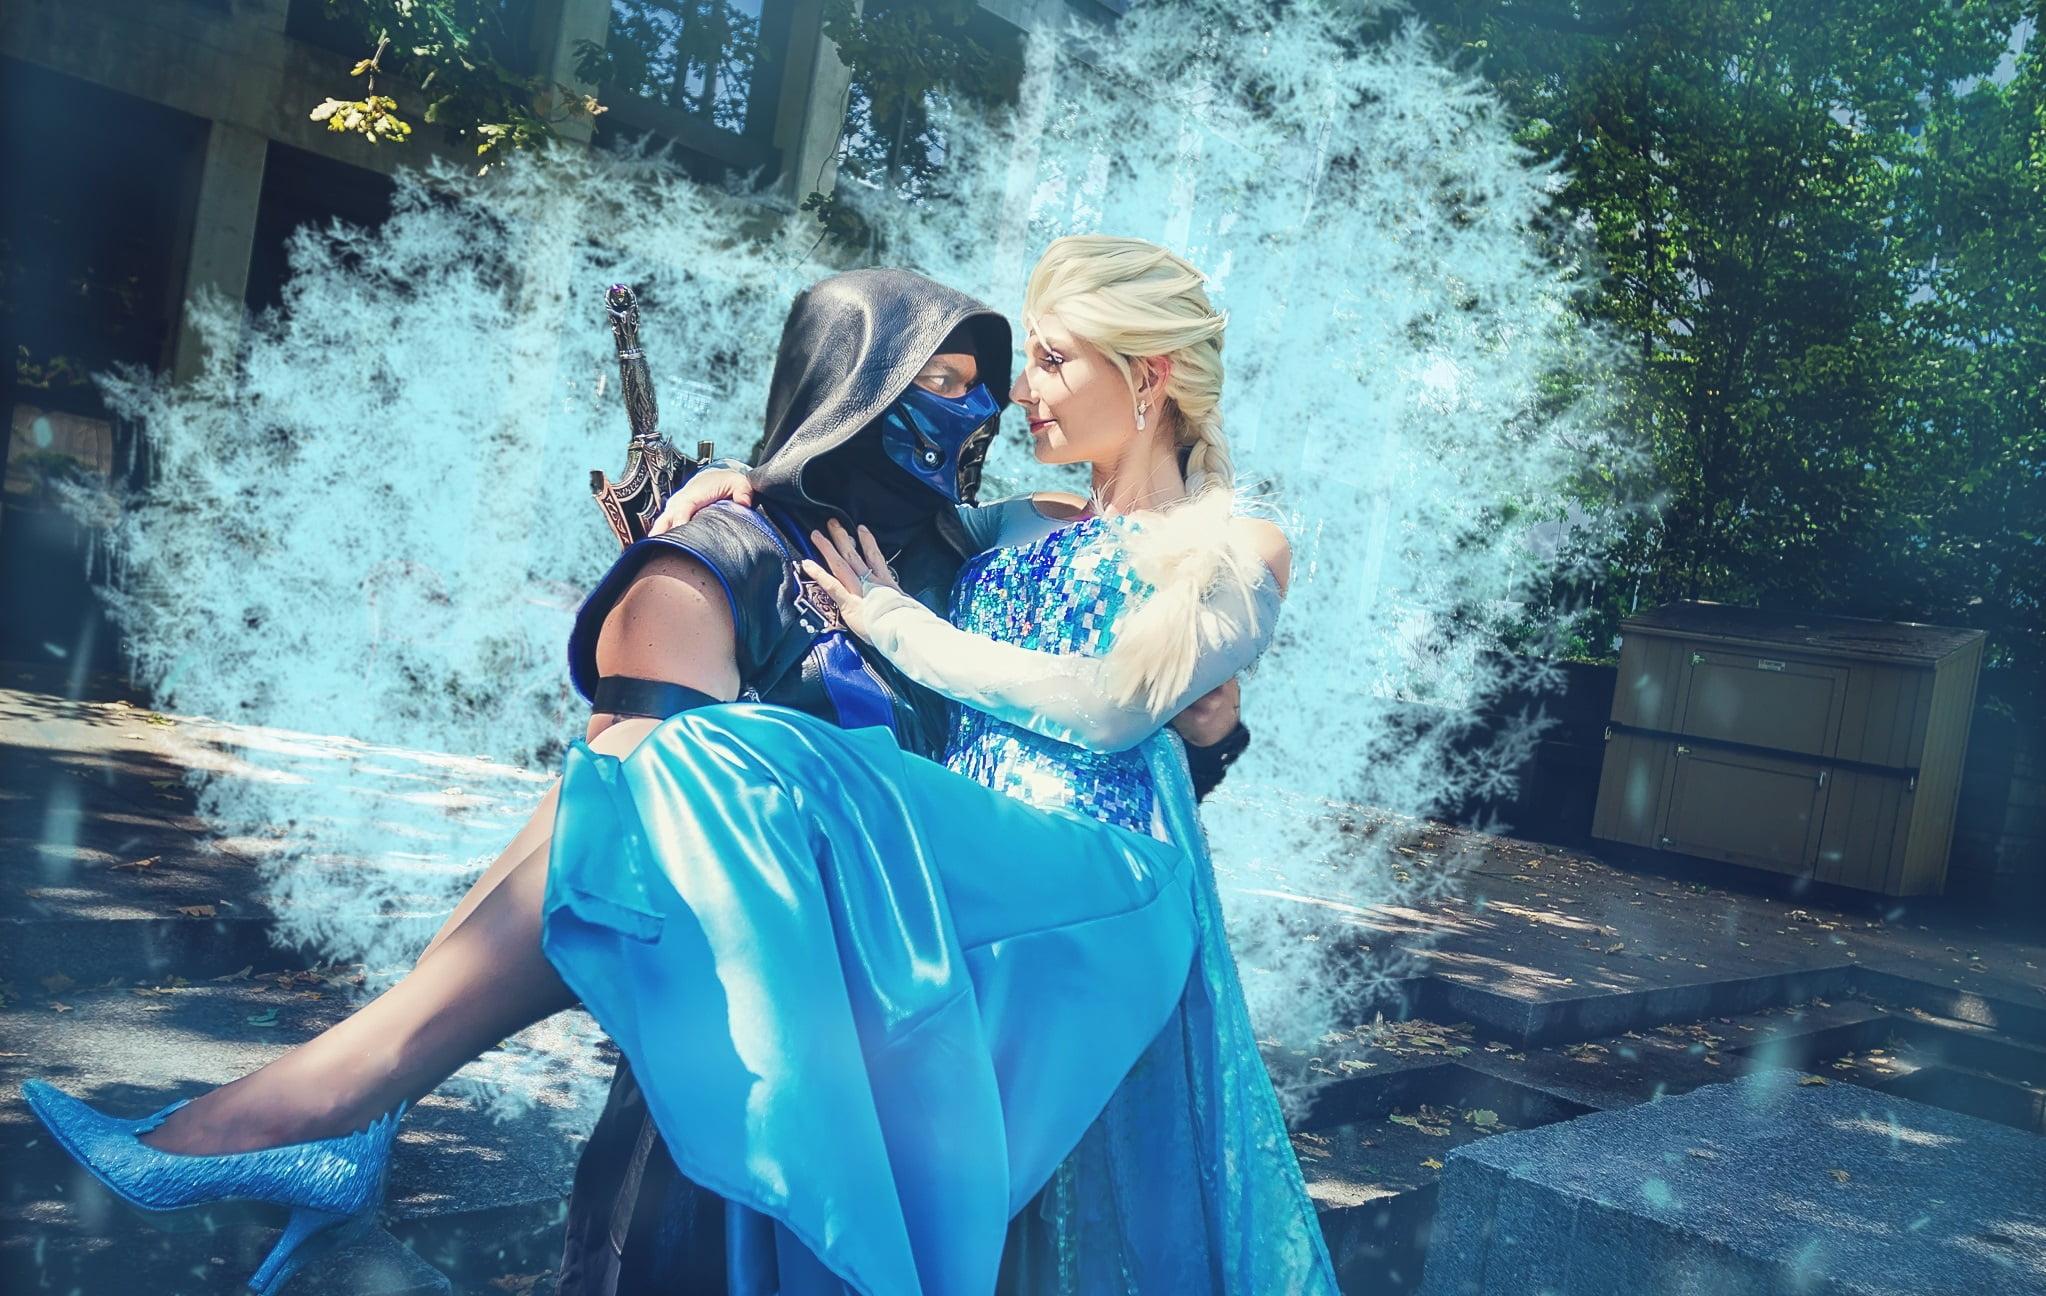 Mortal Kombat's Sub-Zero & Frozen's Elsa